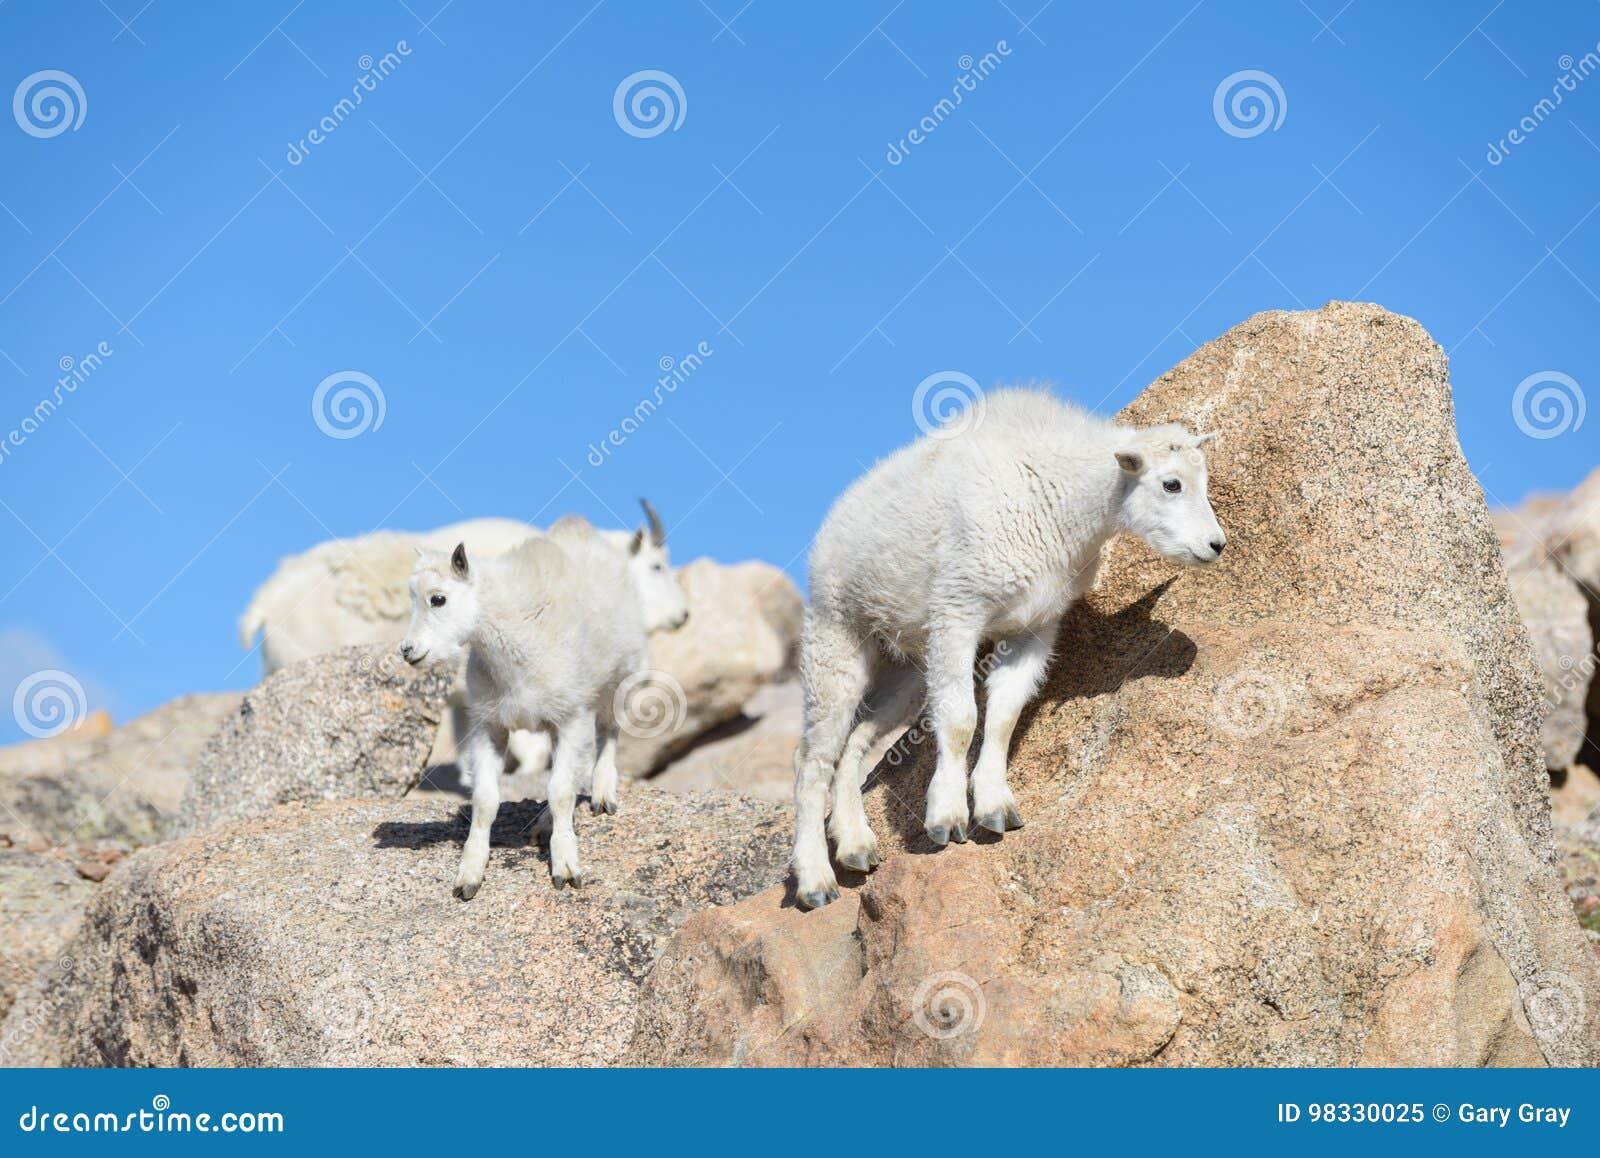 Baby Mountain Goat - Mountain Goats In The Colorado Rocky ...